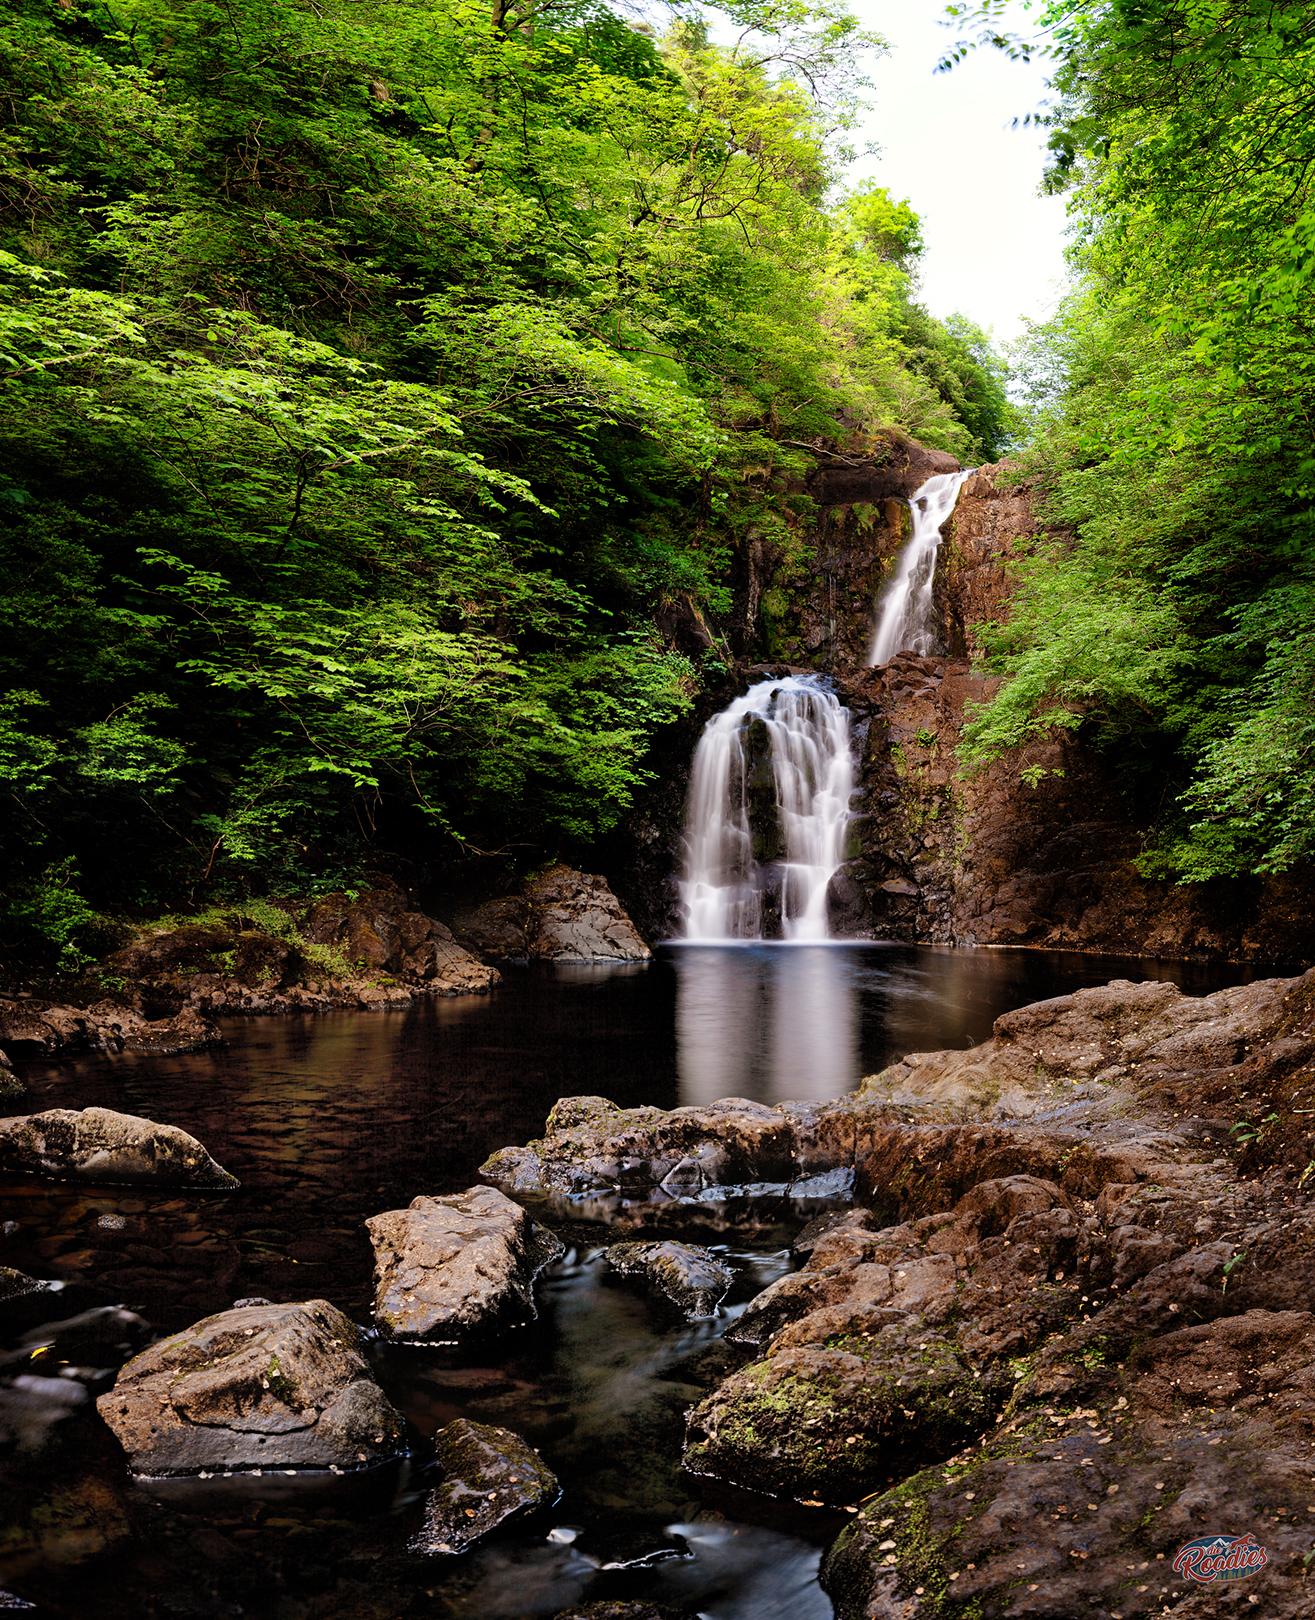 Erfahrungen_Wohnmobil_Hund_Schottland_Isle of Skye_Fall of Rha